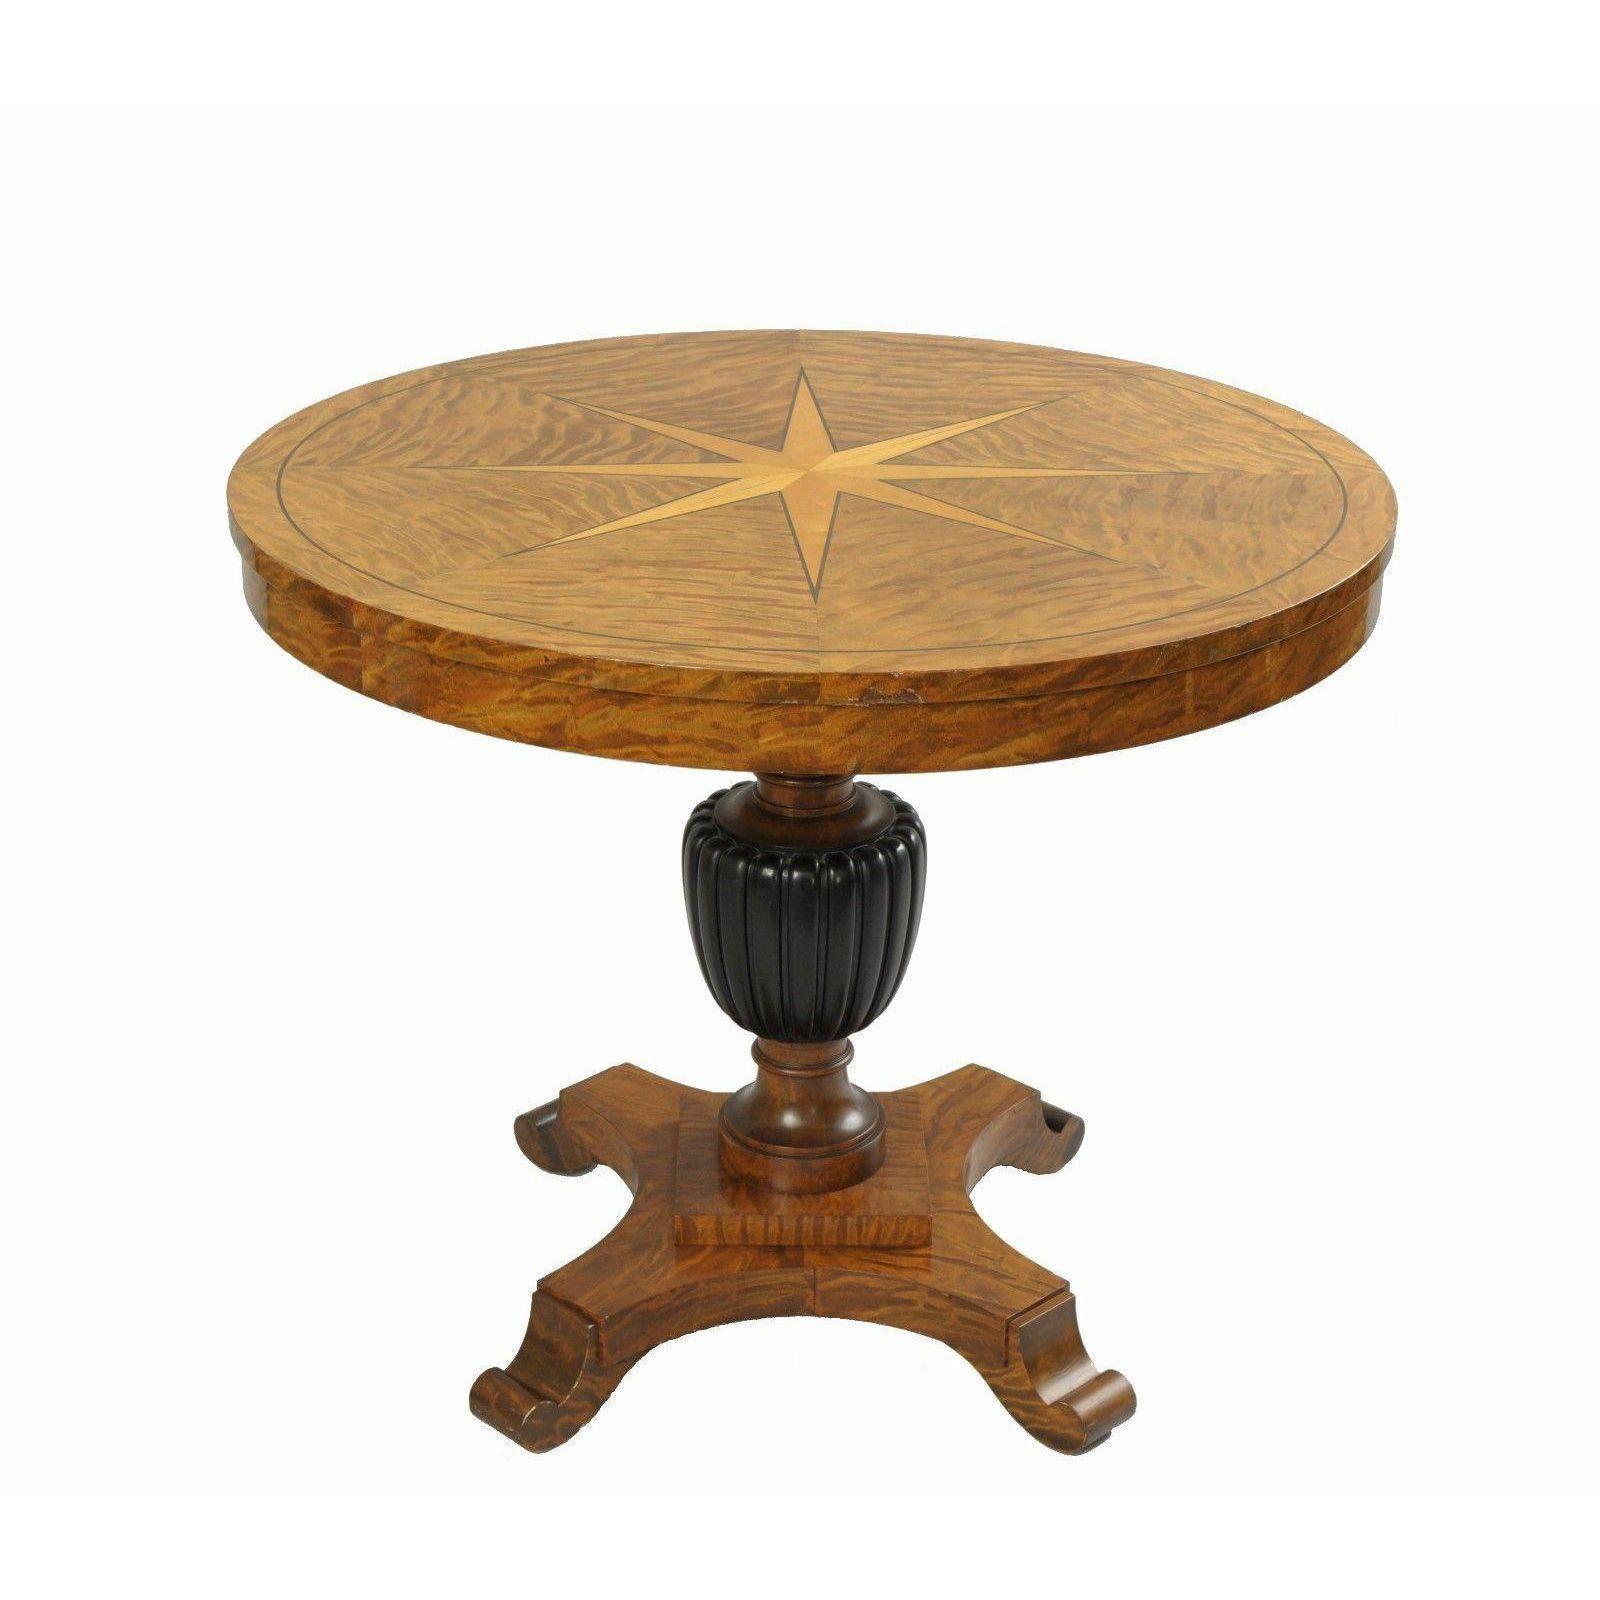 biedermeier style 36 round center table star inlaid marquetry burl